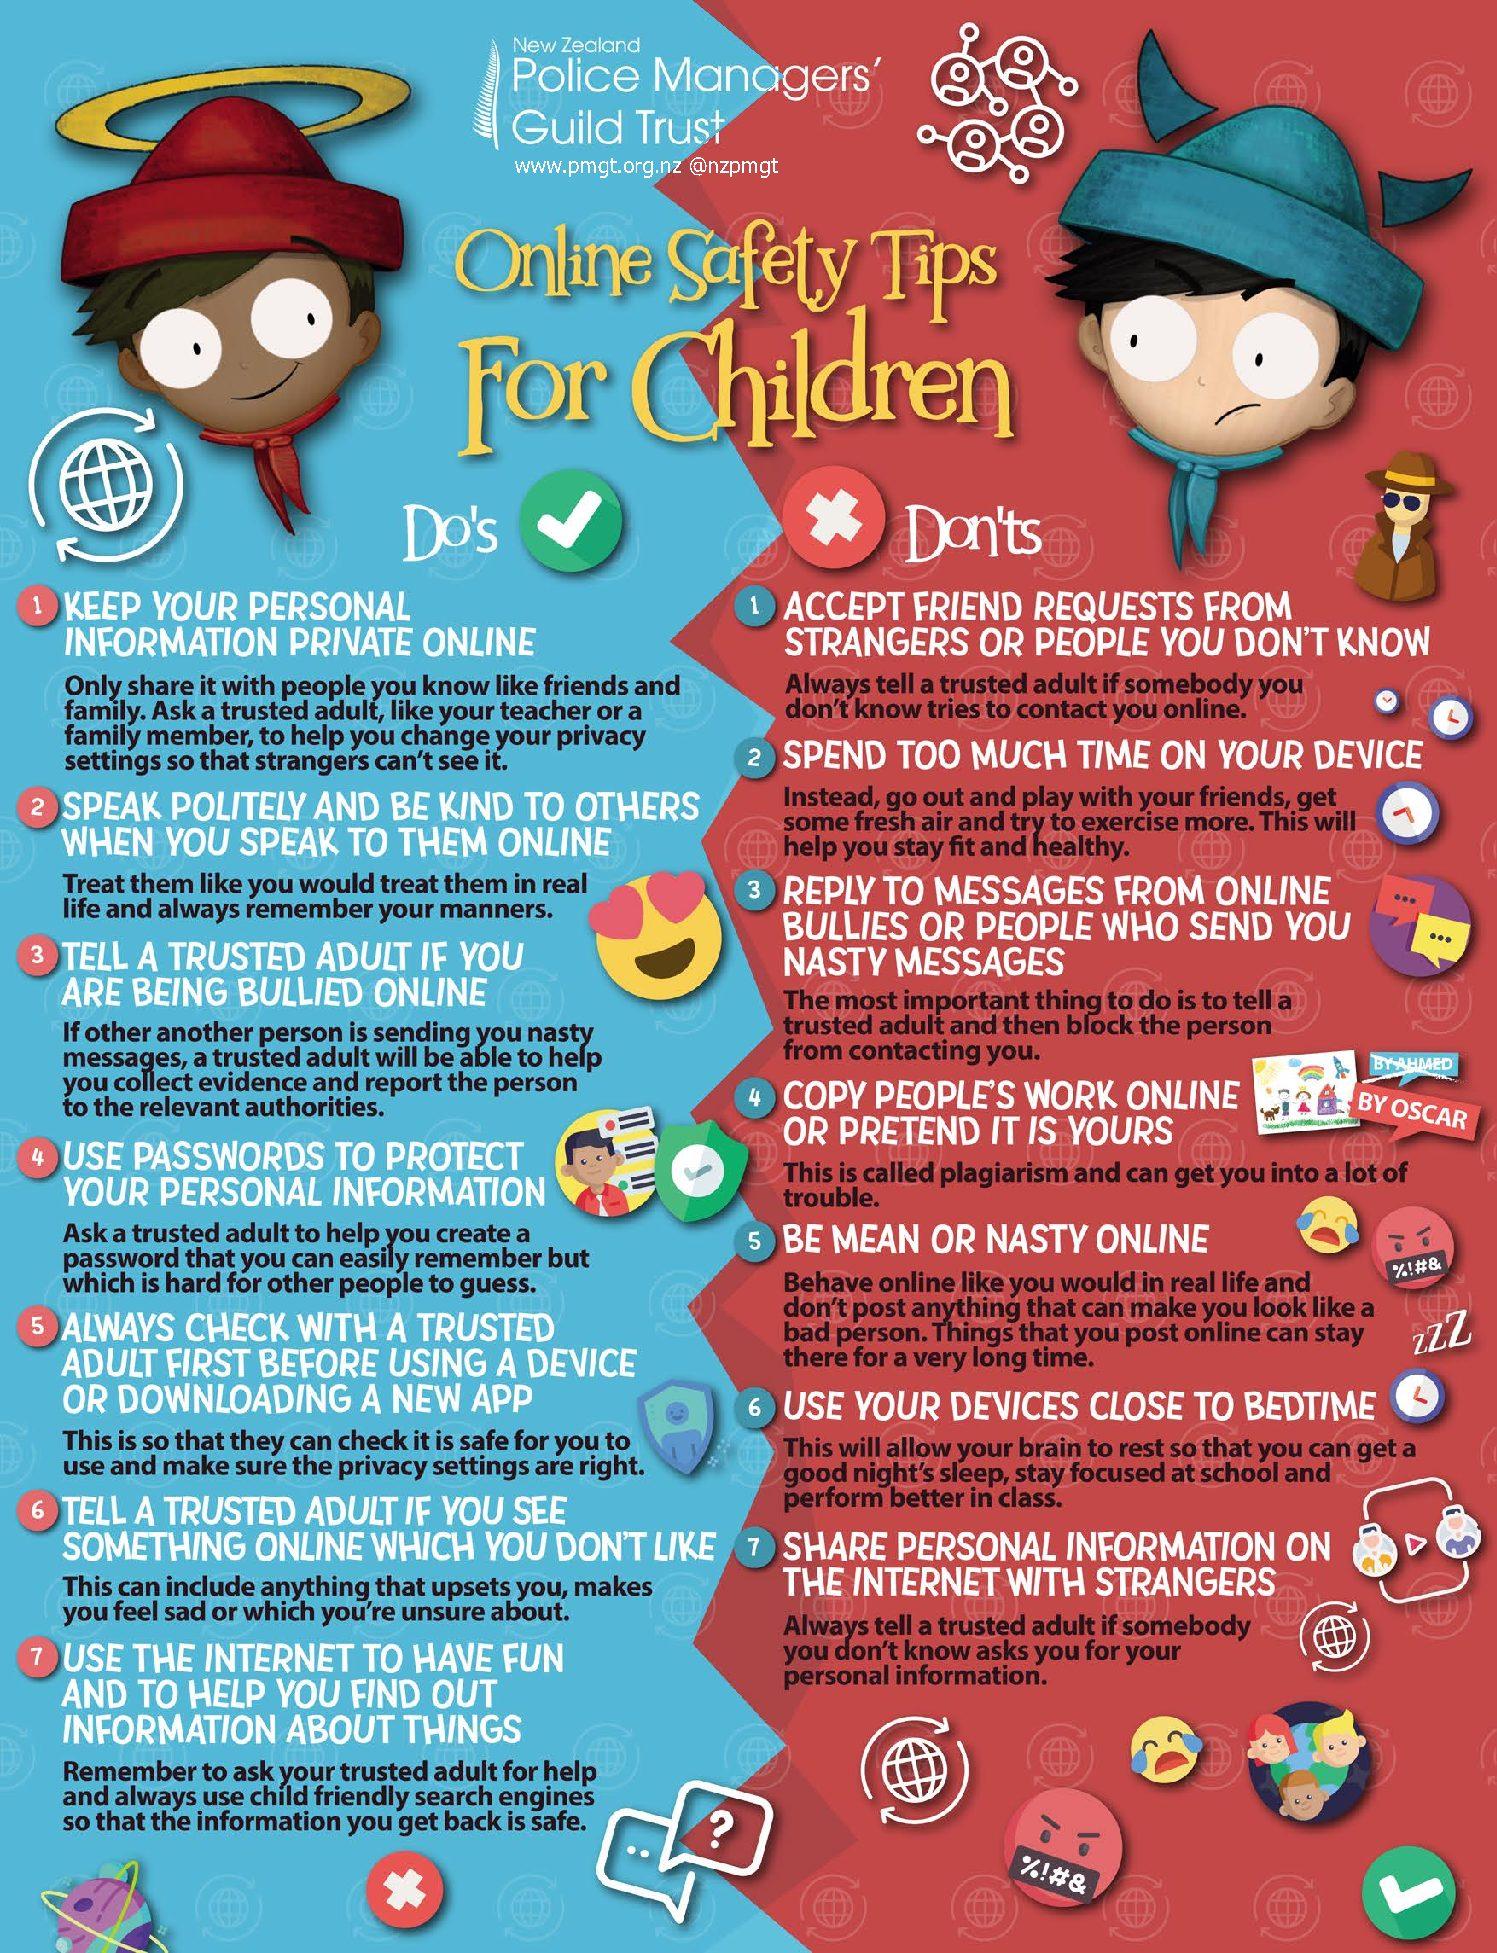 Online Safety Tips for Children